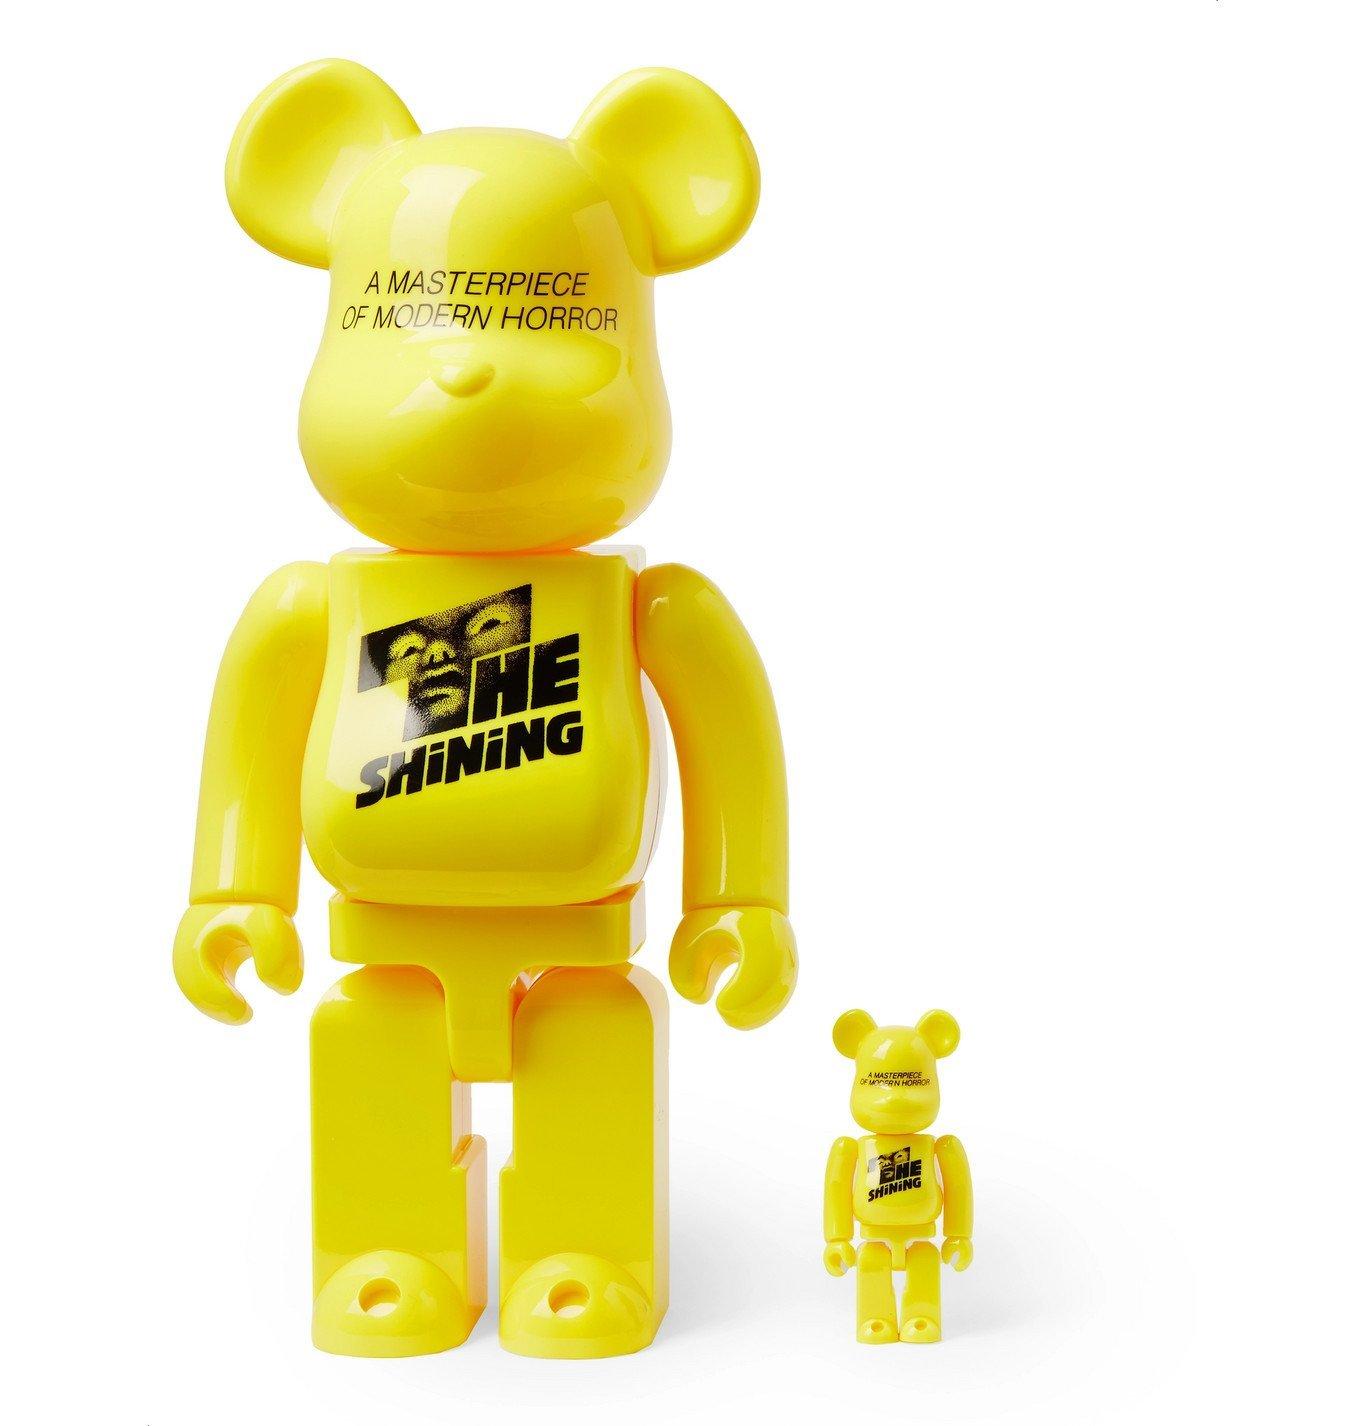 Photo: BE@RBRICK - The Shining 100% & 400% Printed Figurine Set - Yellow